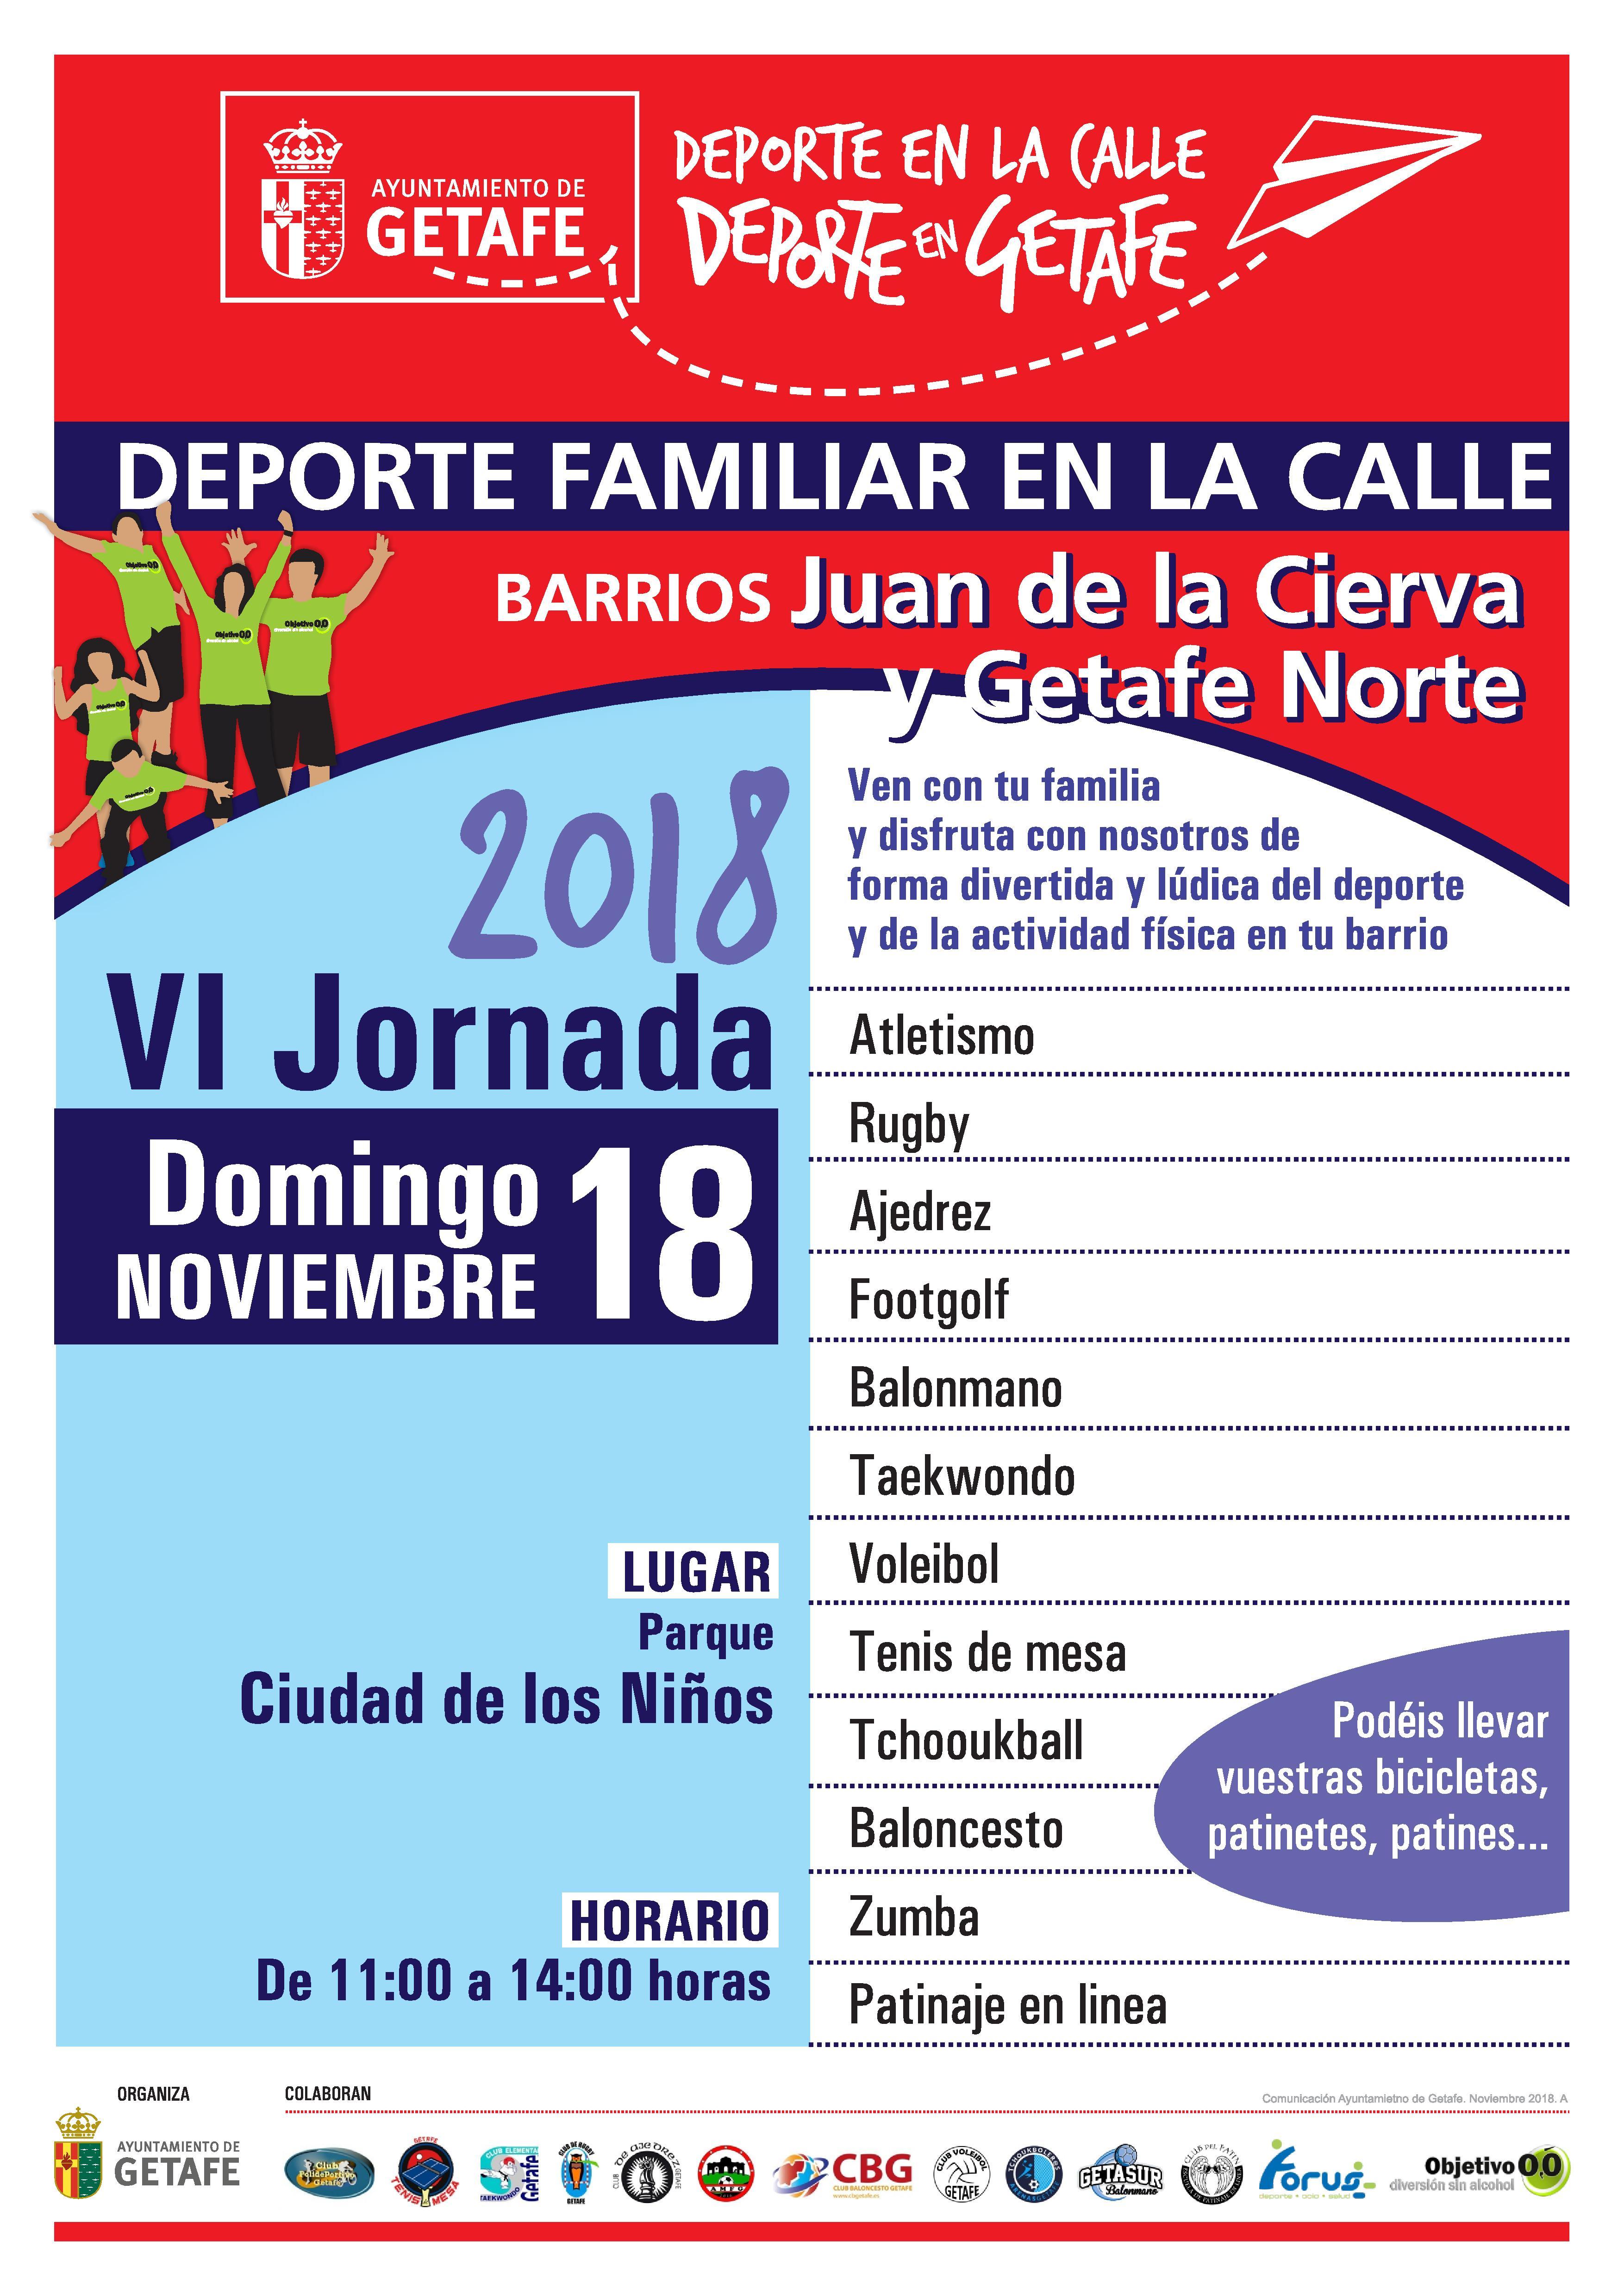 VI Jornada del Deporte Familiar en la Calle 2018